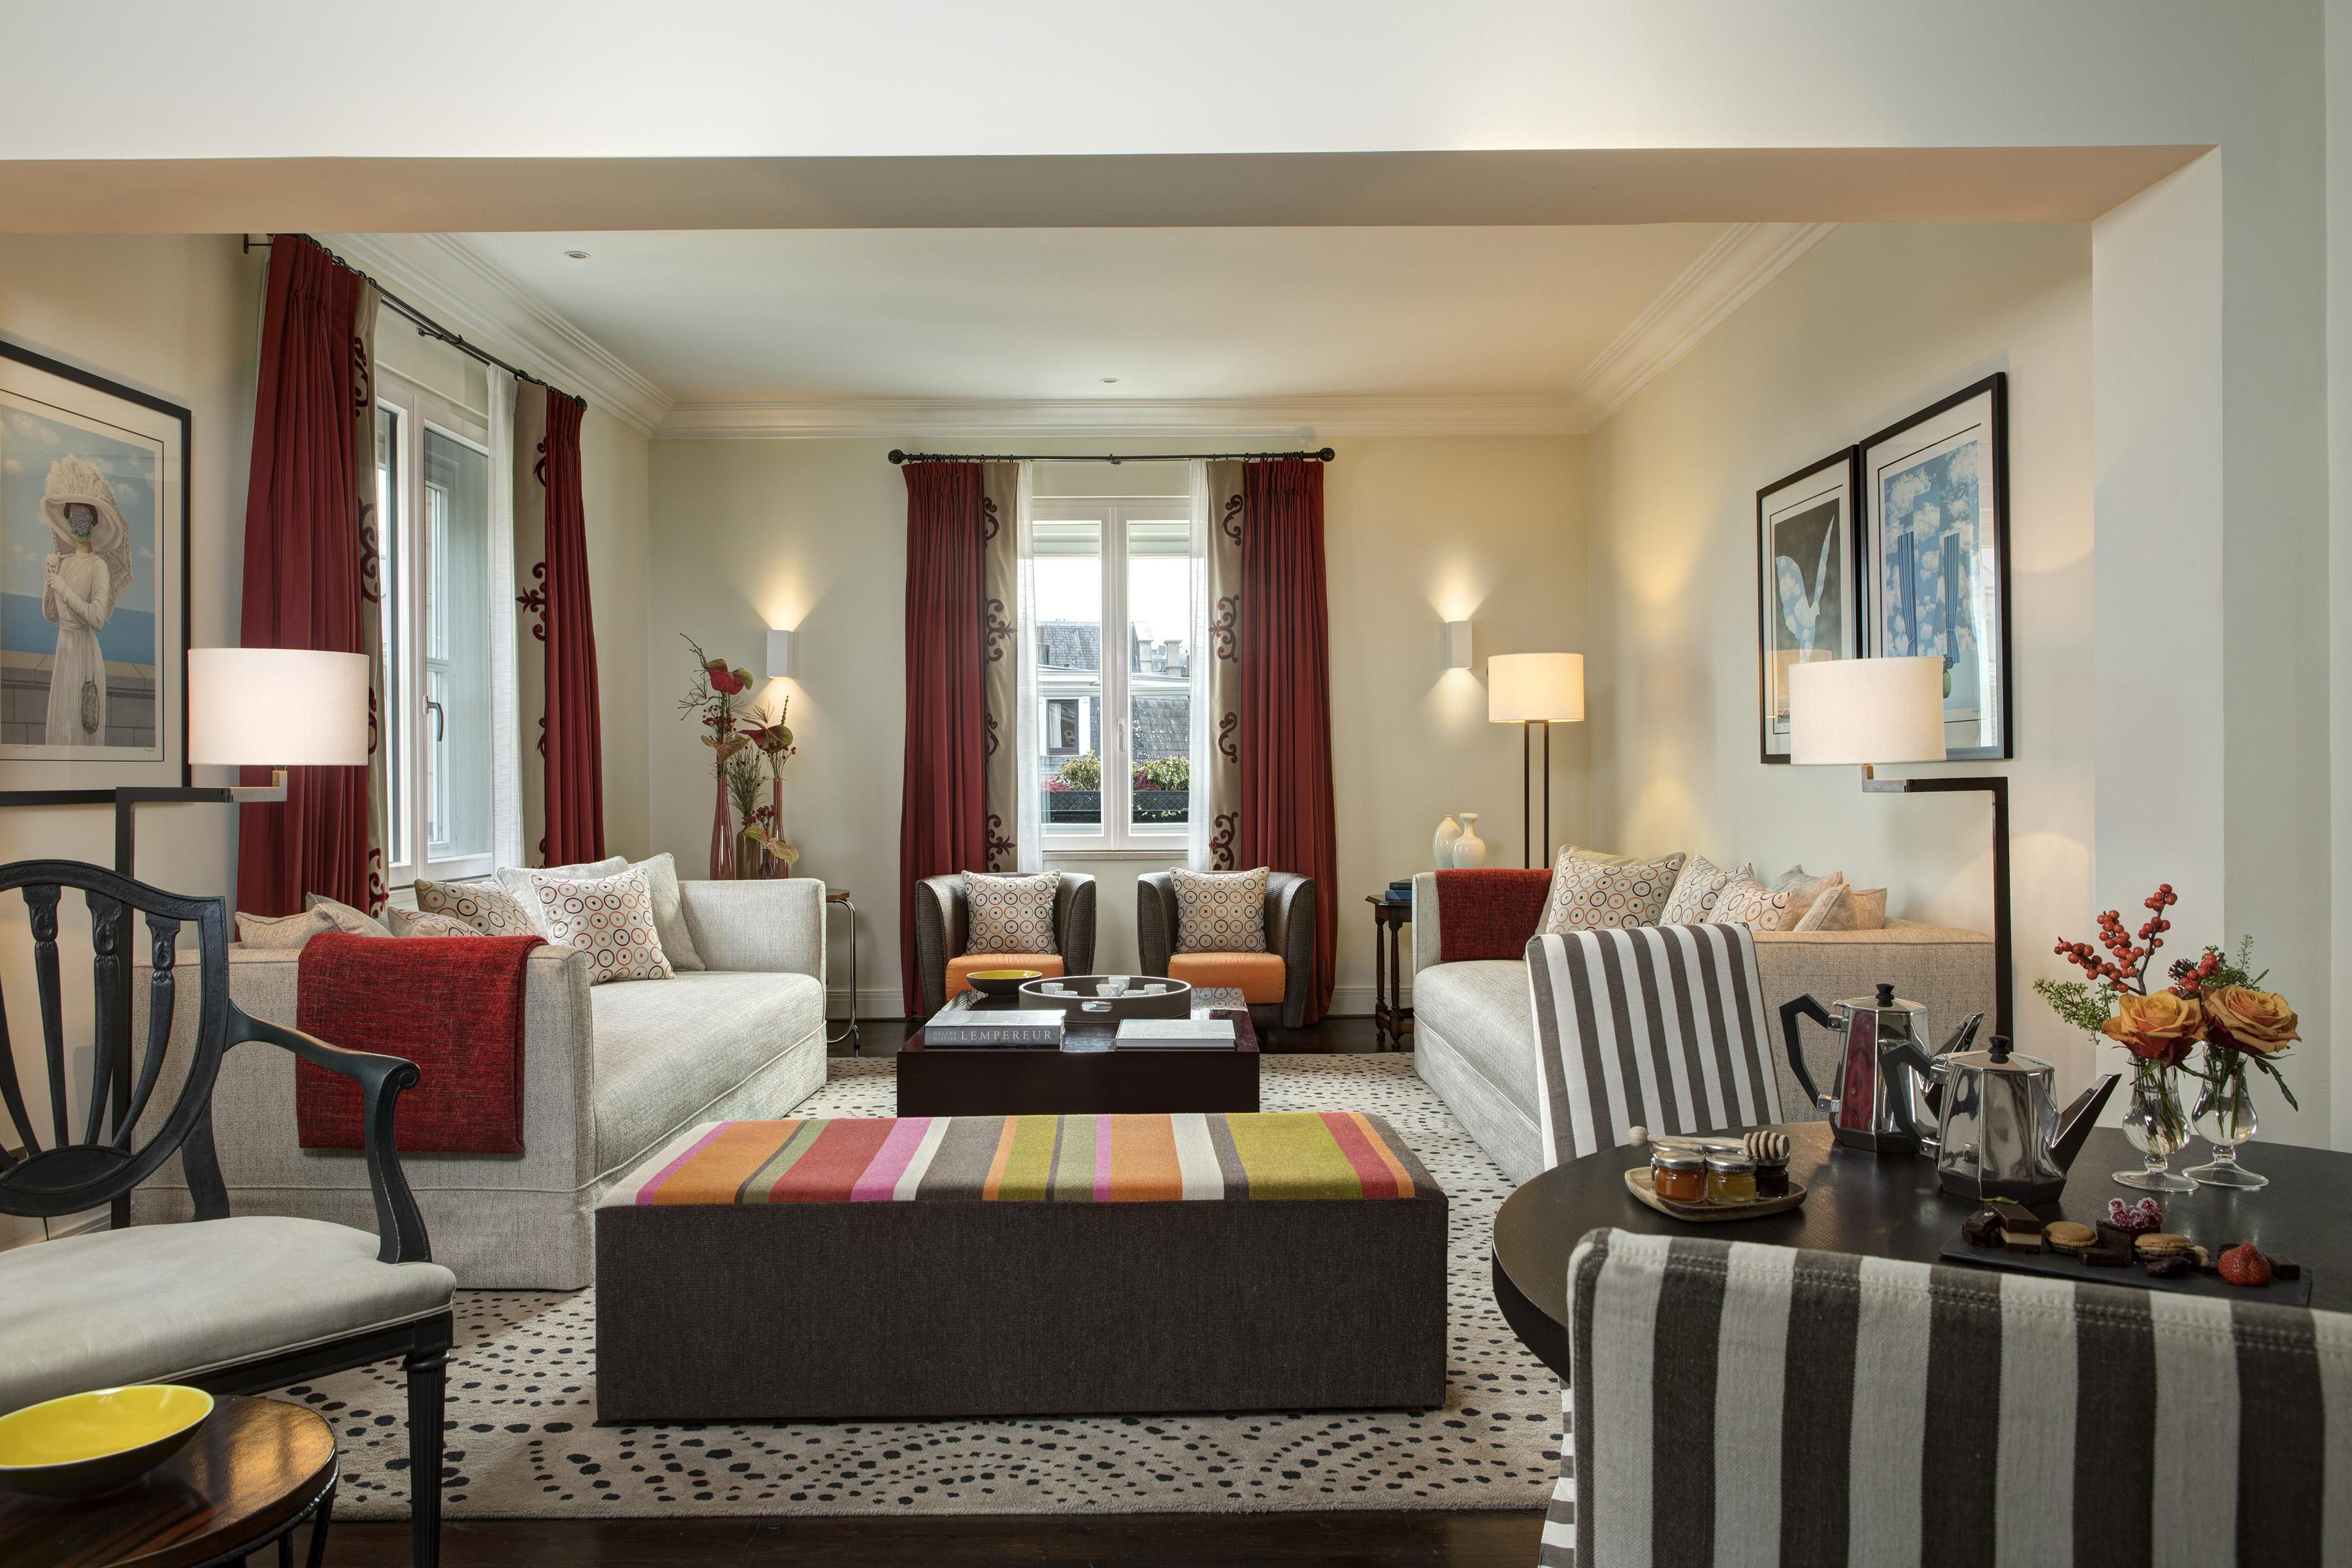 RFH Hotel Amigo - Margritte Suite 9190 JG Nov 18